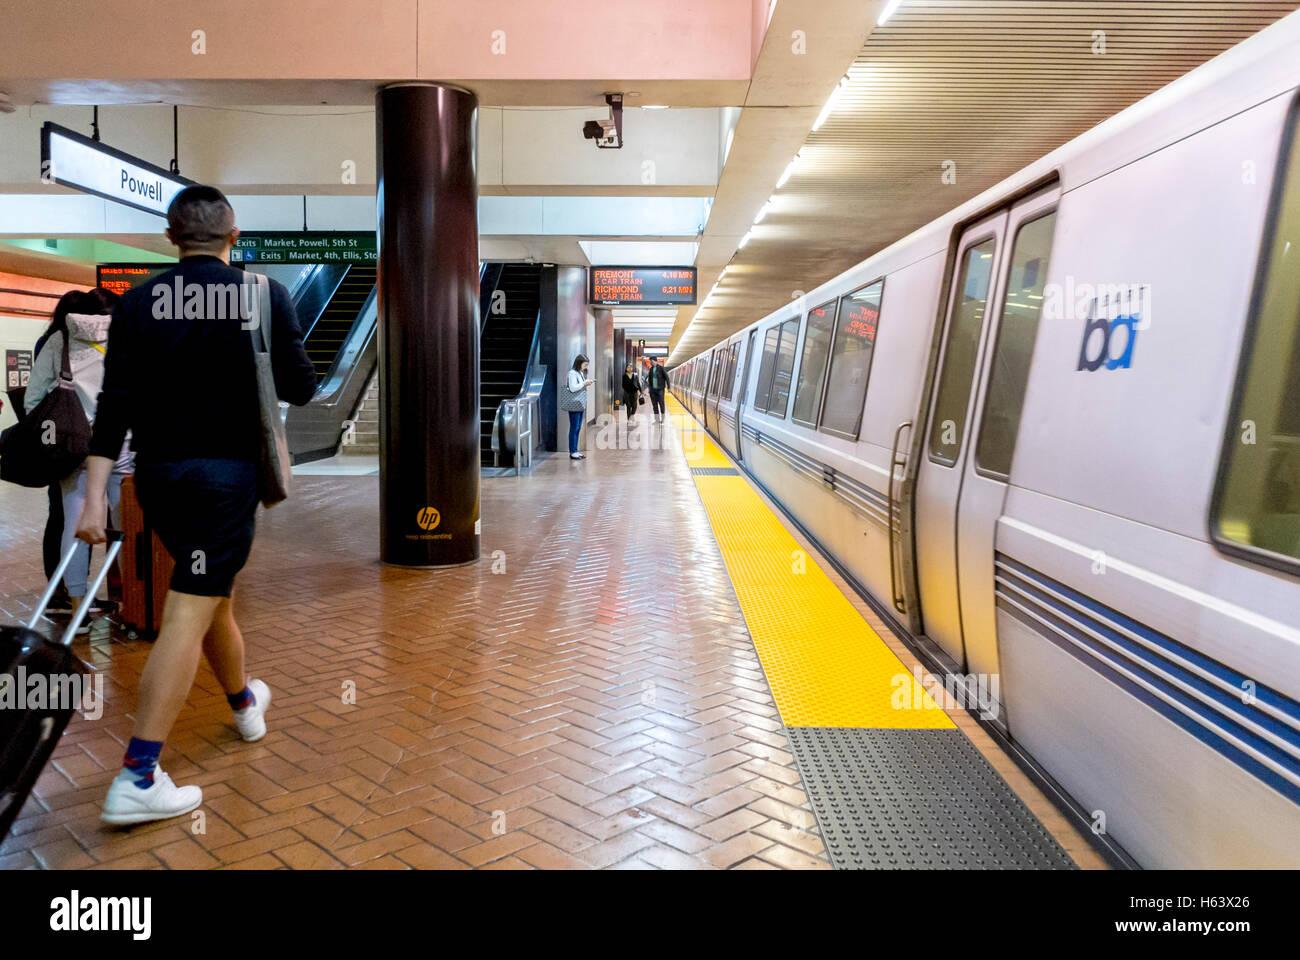 San Francisco, CA, USA, People on Platform in BART Subway Station Scenes, - Stock Image